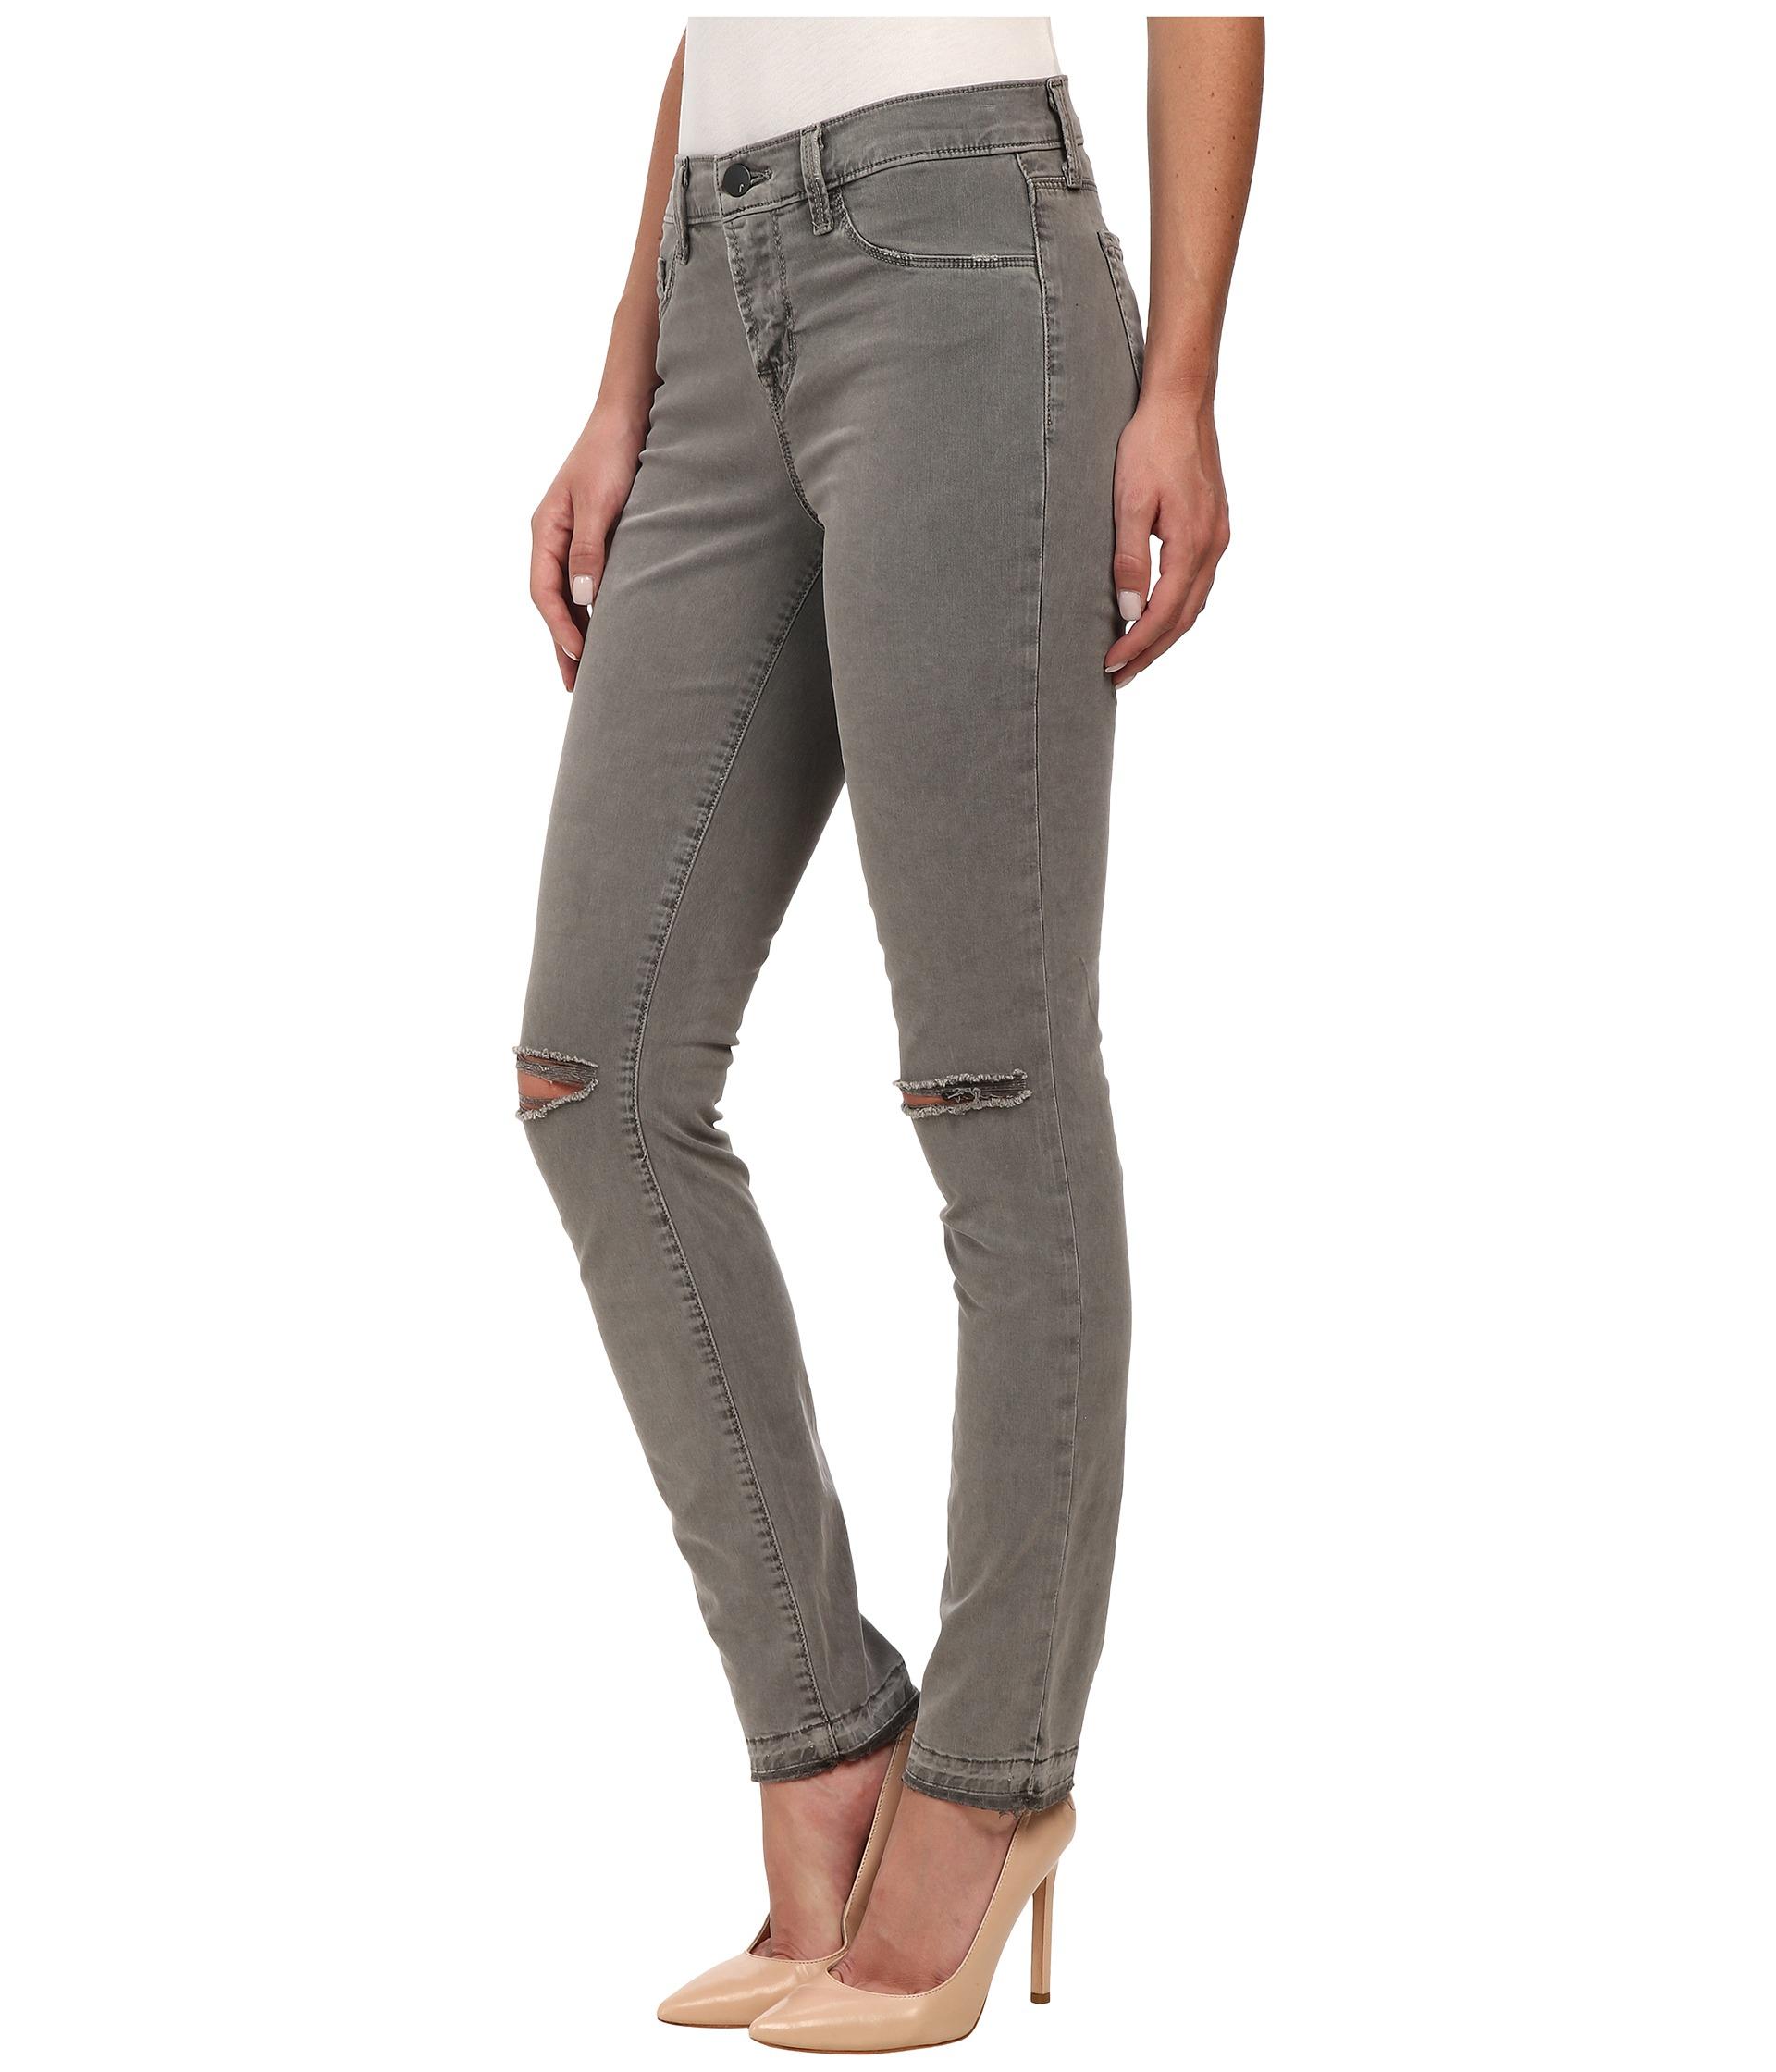 Silver Maternity Jeans - Xtellar Jeans